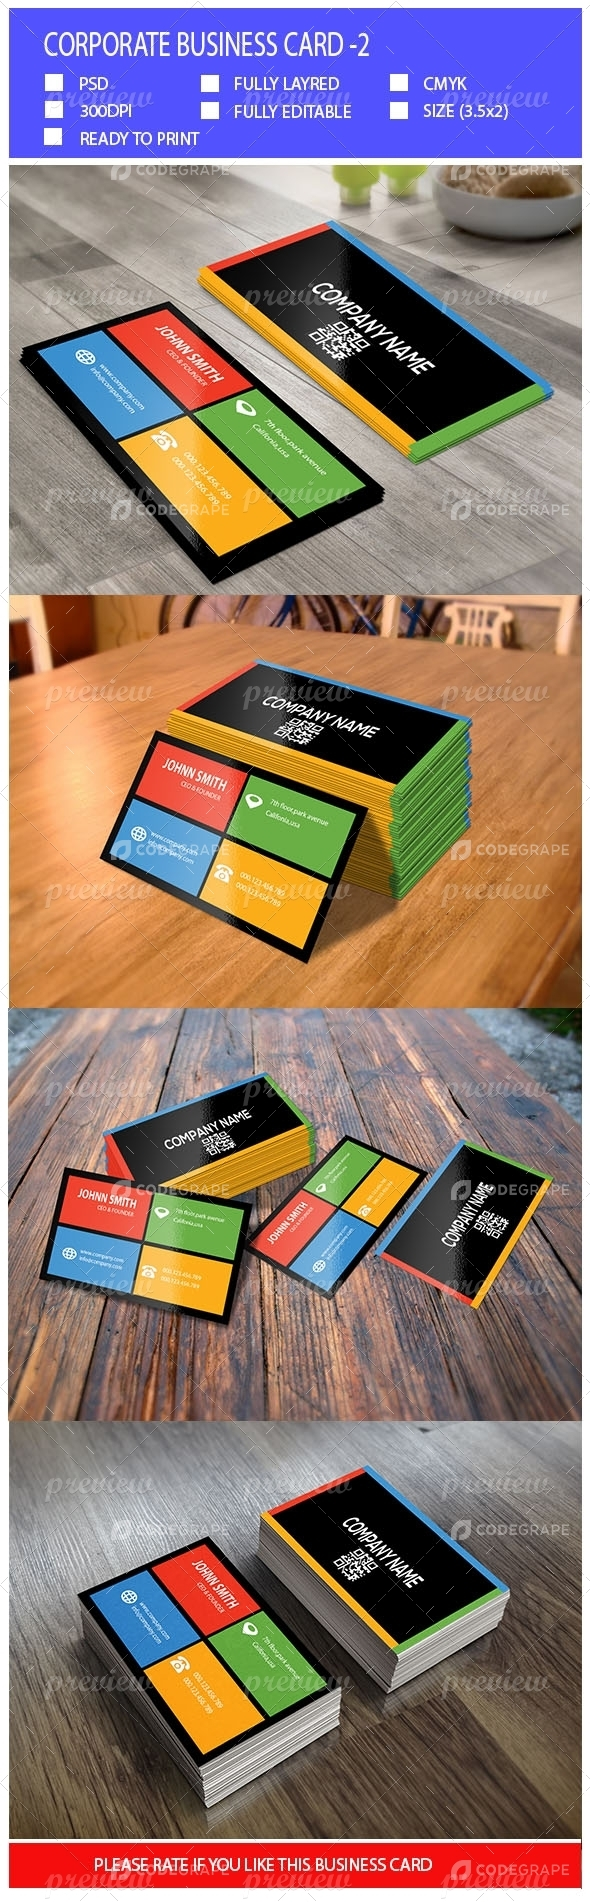 Corporate Business Card-2